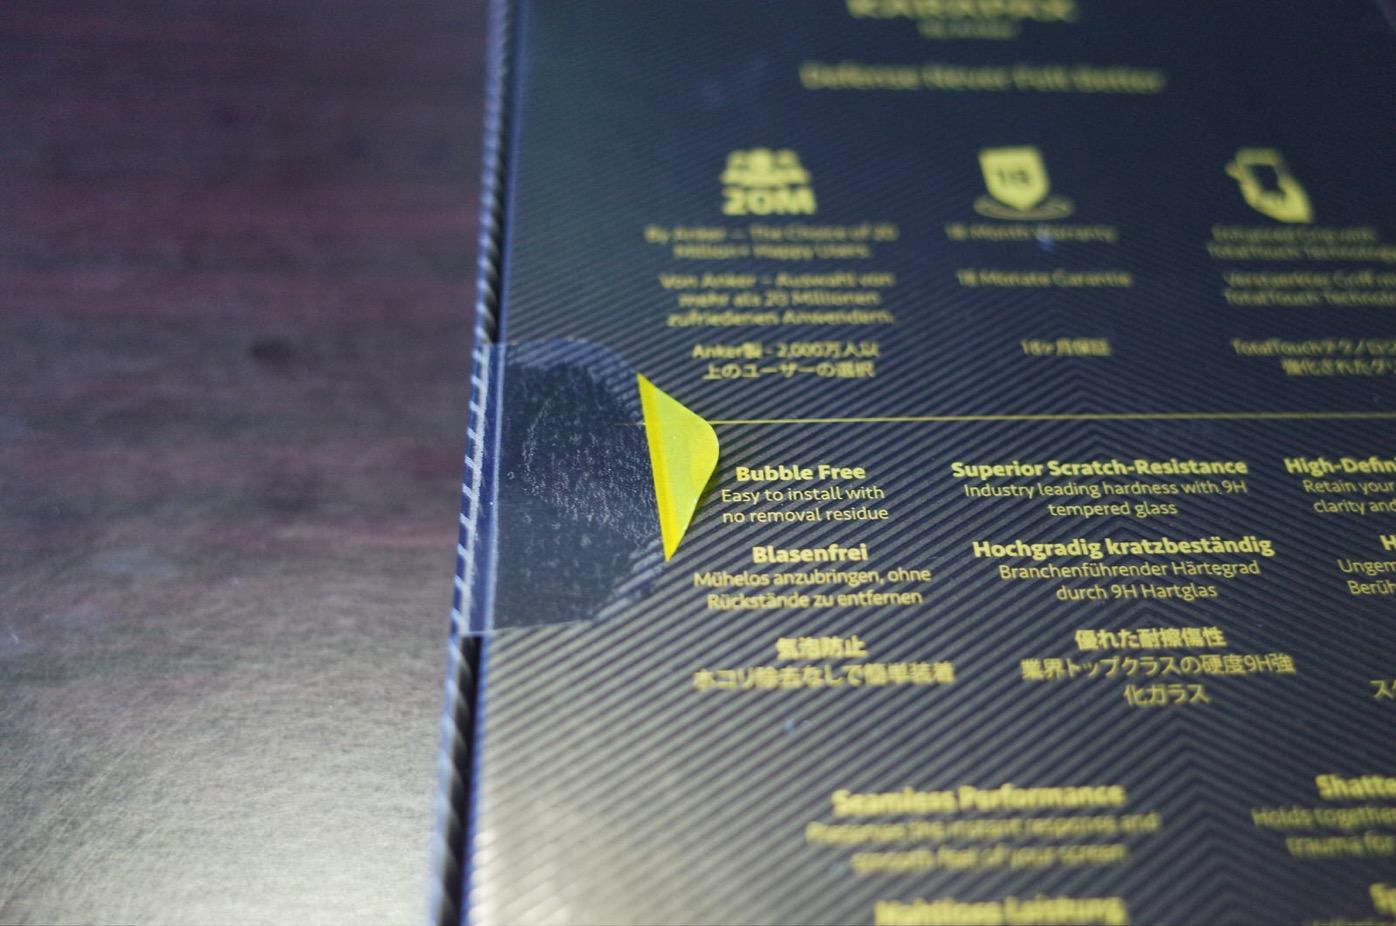 Anker KARAPAX GlassGuard iPhone X用 強化ガラス液晶保護フィルム-4